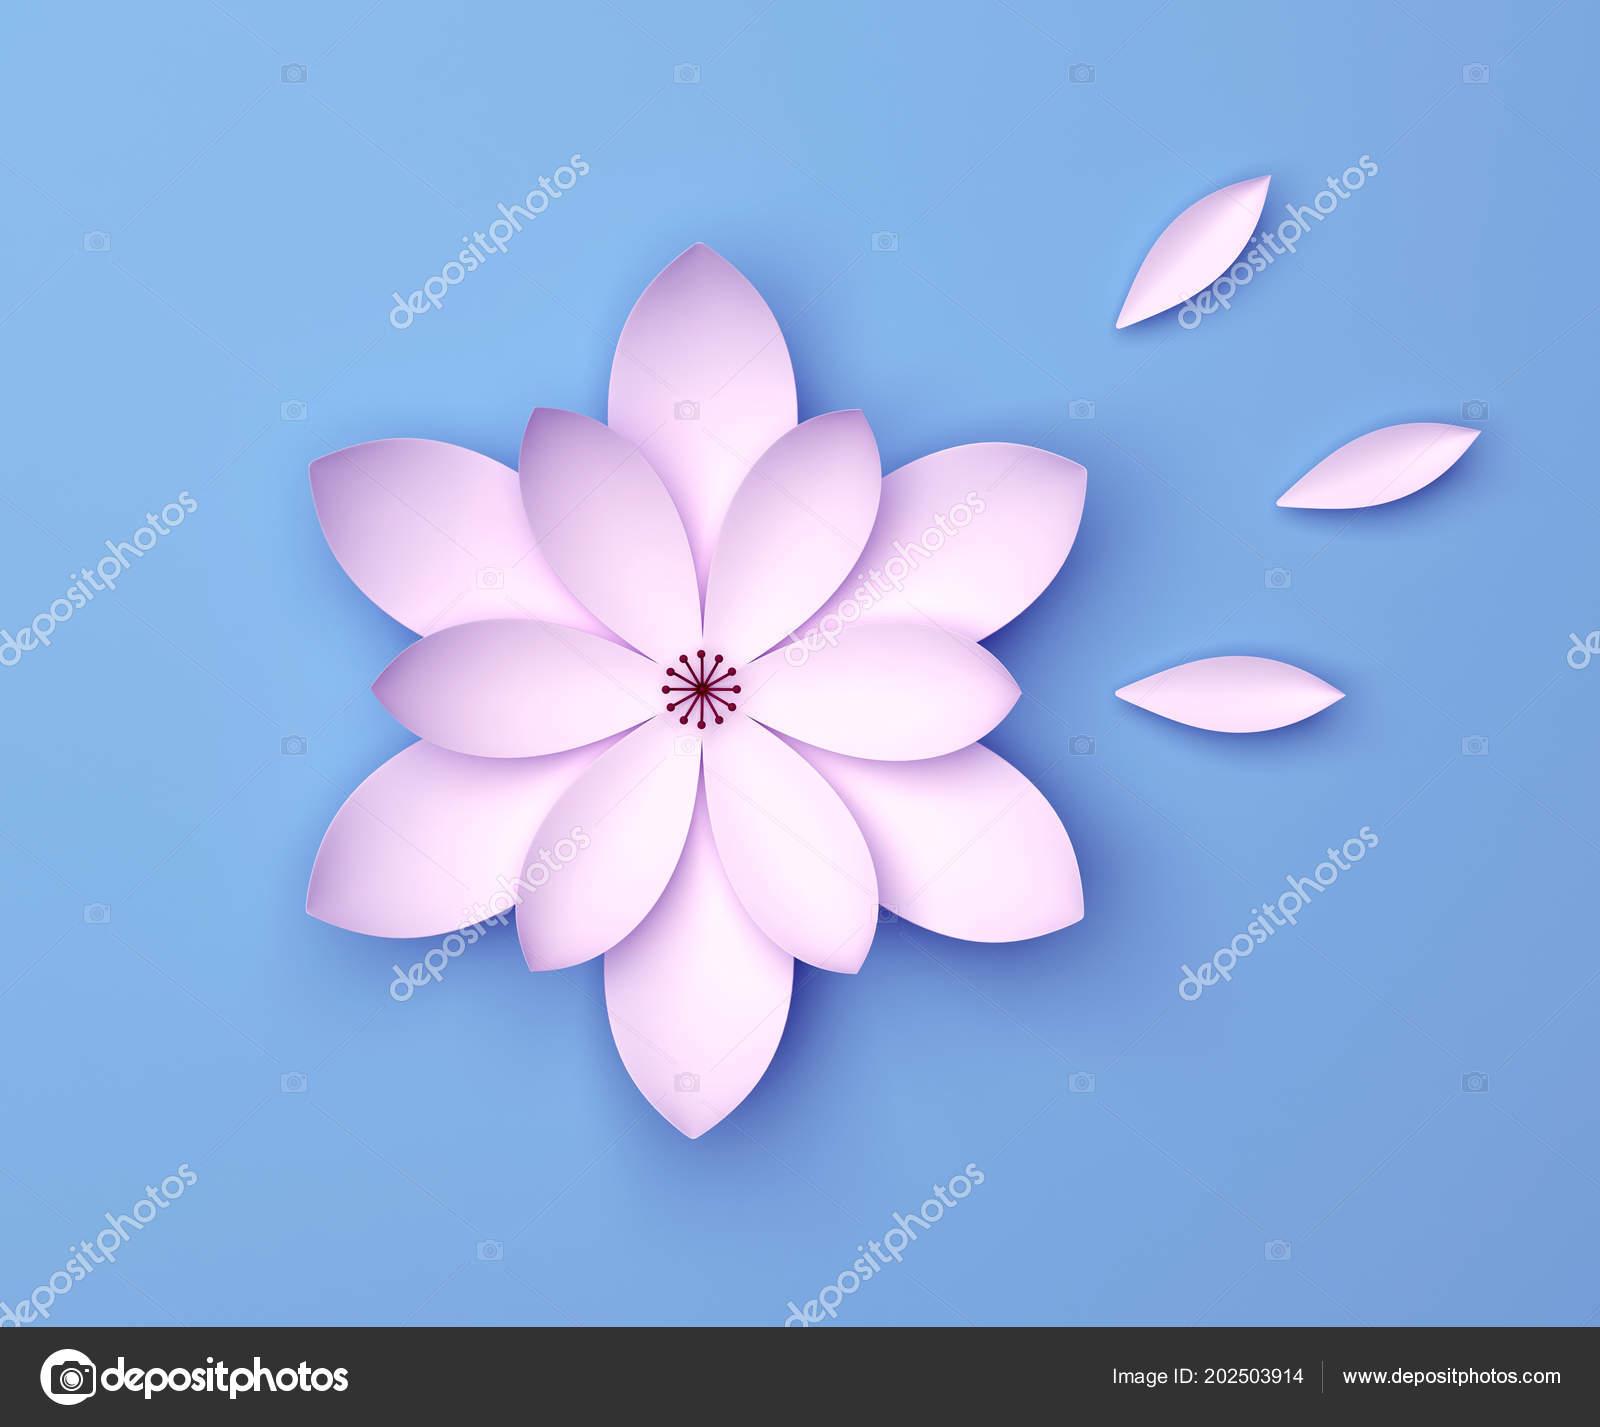 Single color decorative flower on blue background paper origami single color decorative flower on blue background paper origami lily stock photo izmirmasajfo